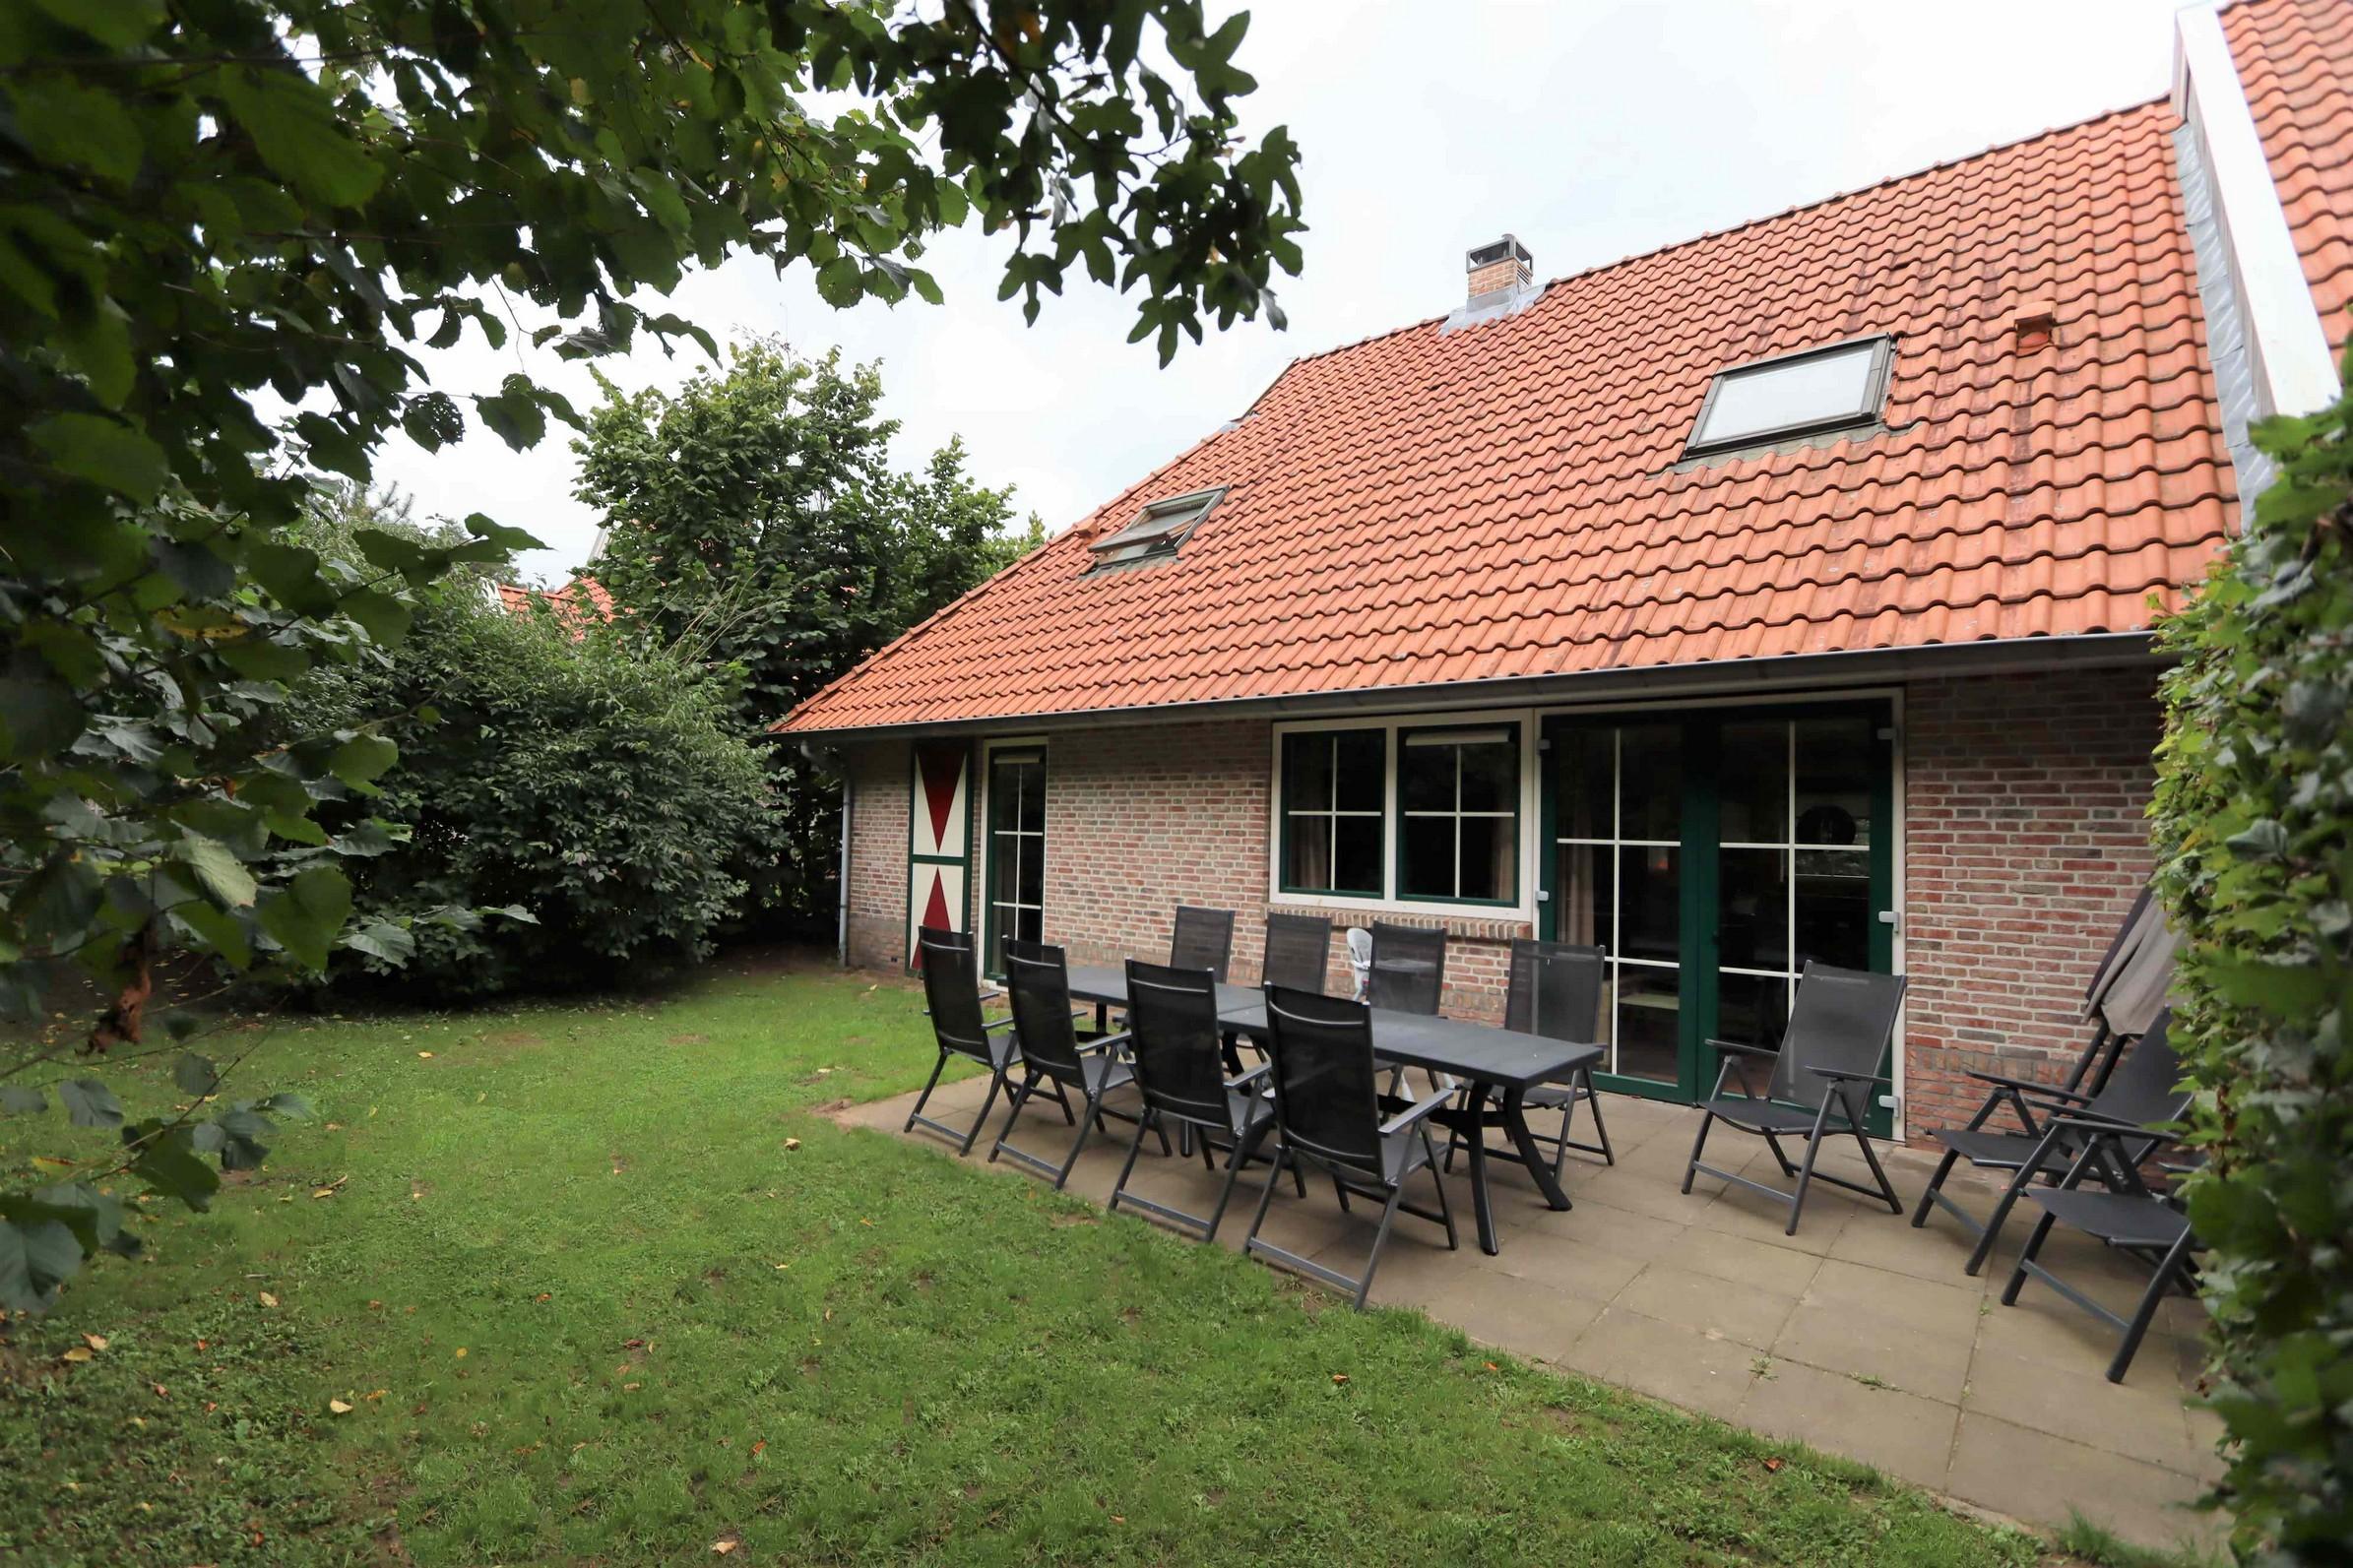 1B. Recreatiewoning nr. 5 12-persoons Landal Landgoed De Hellendoornse Berg